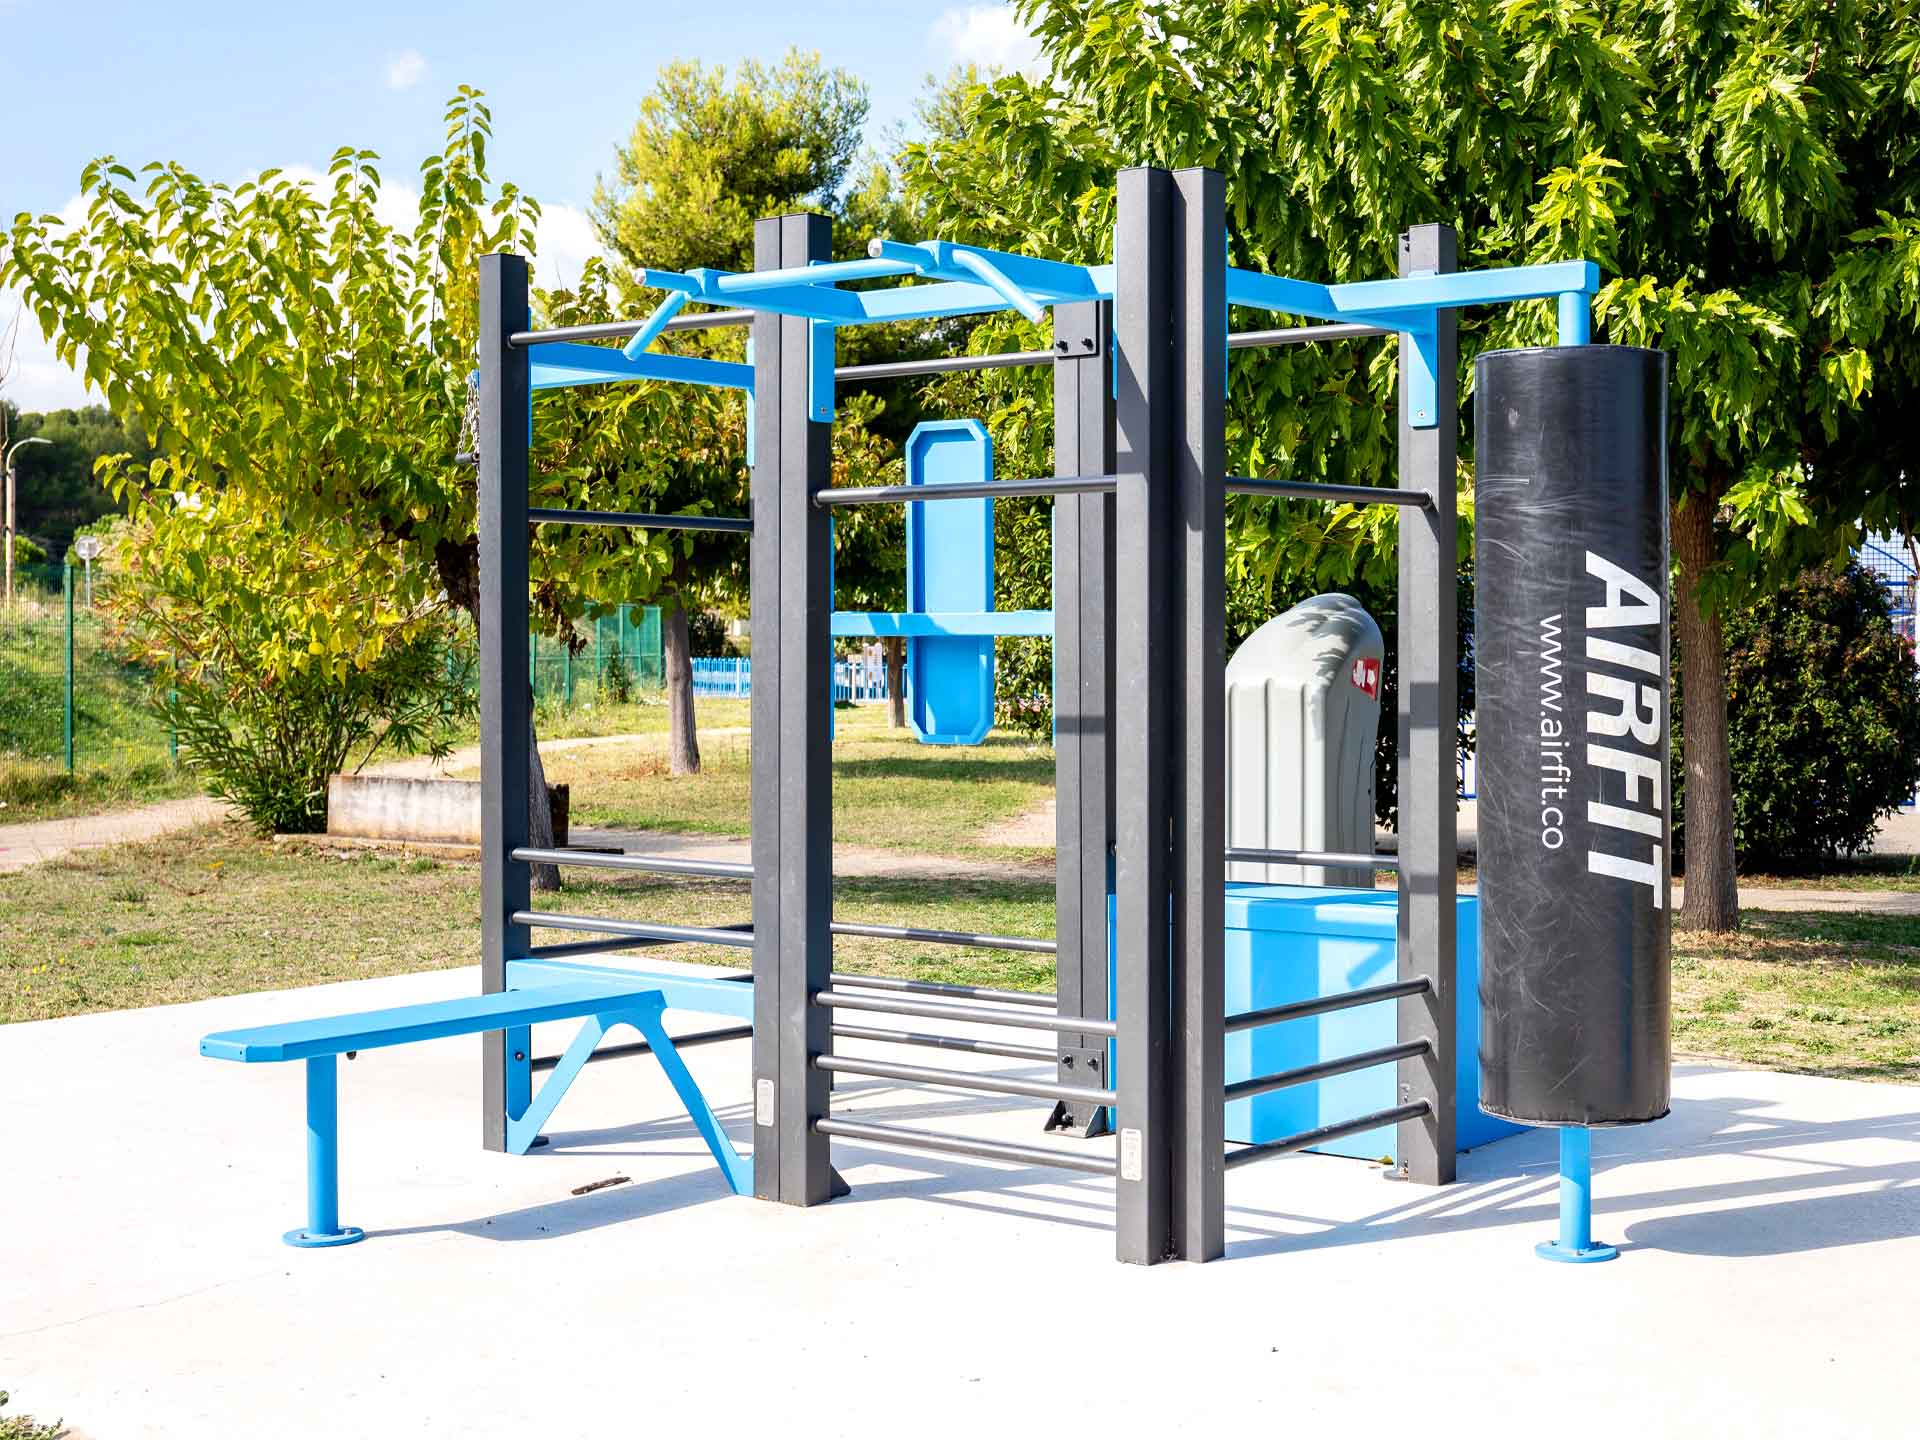 Photos des équipements sportifs de plein air d'Orgon